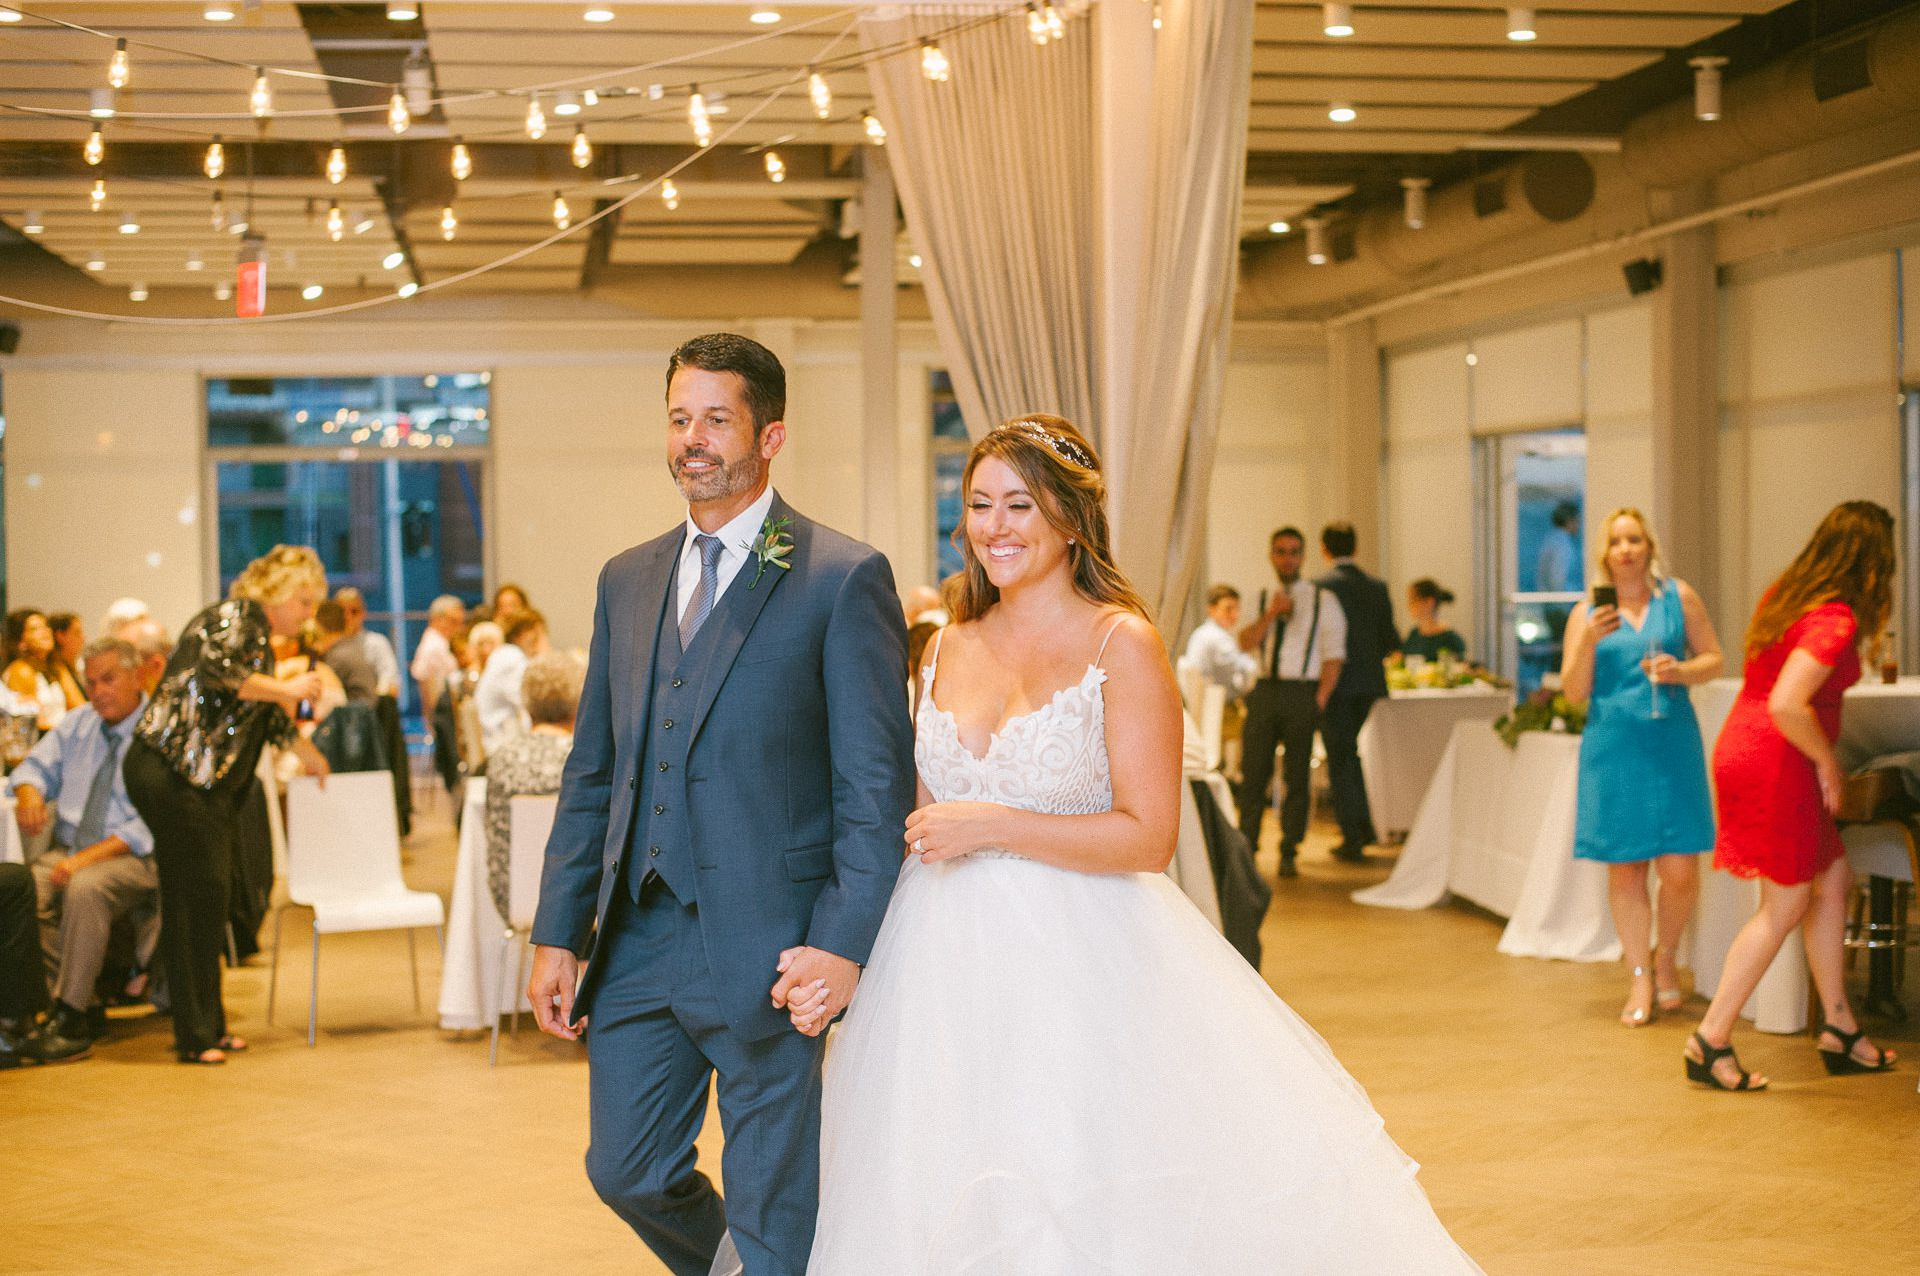 Nuevo Modern Mexican Wedding Photographer in Cleveland 2 6.jpg